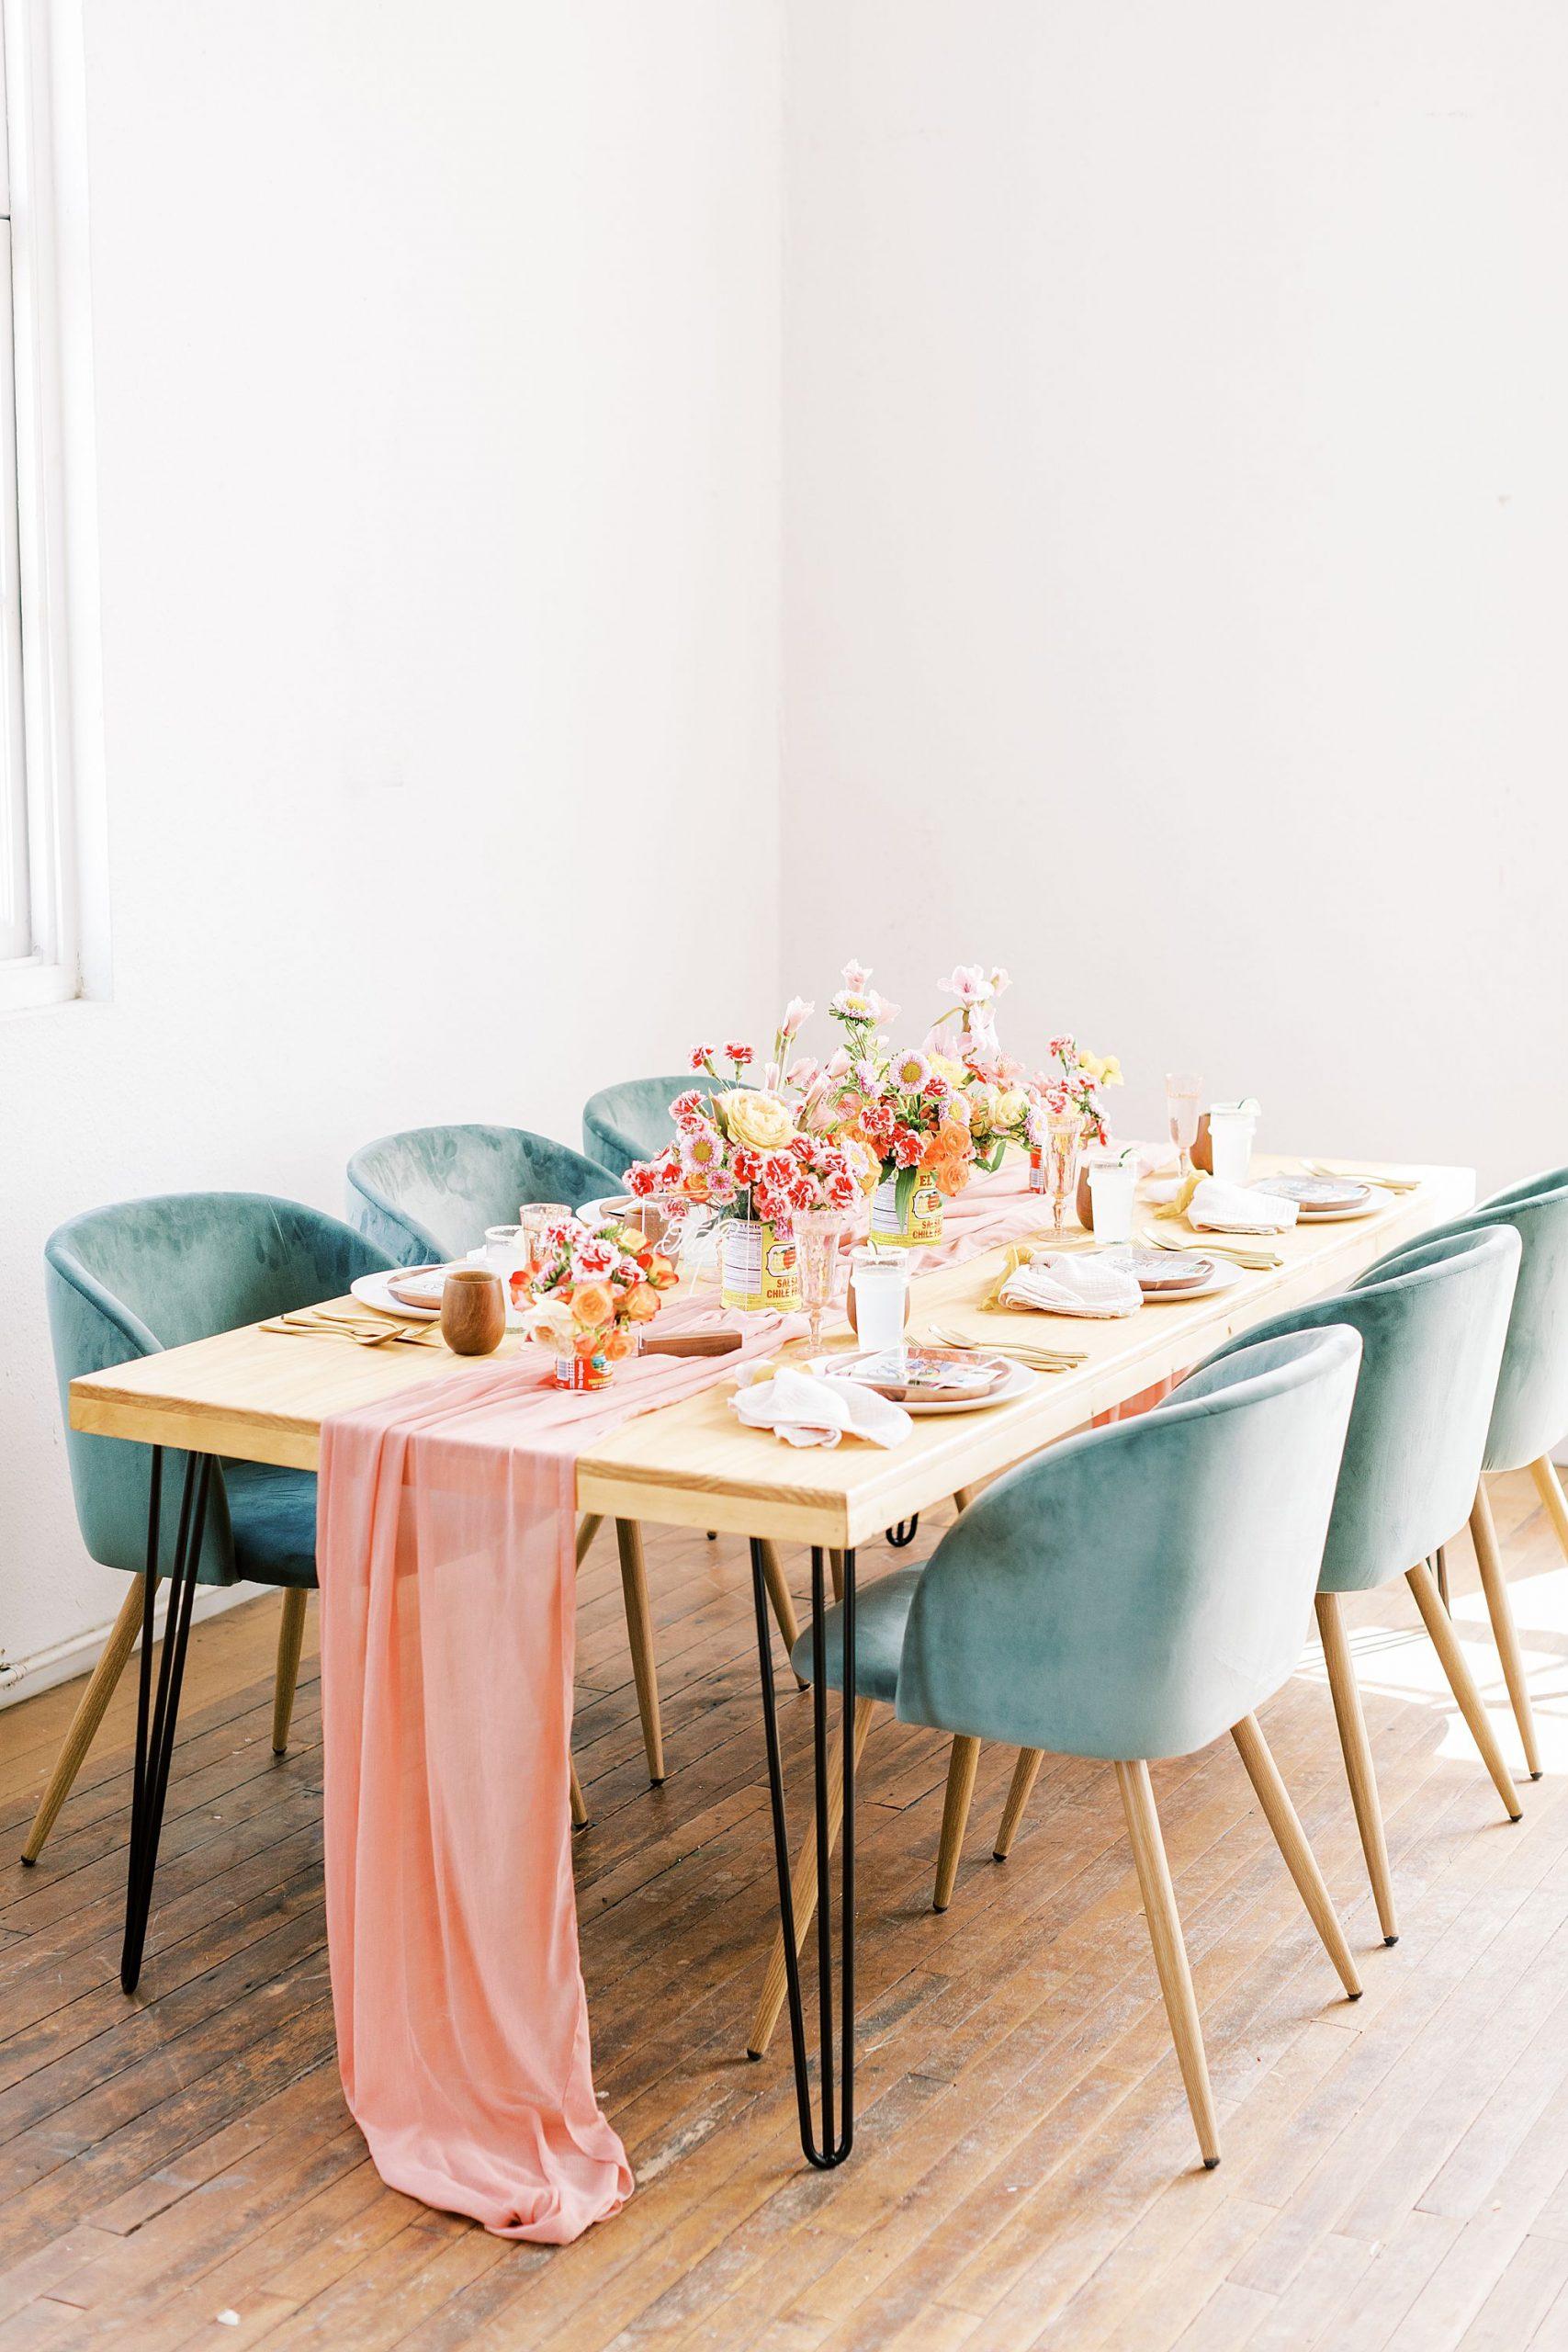 Cinco De Mayo Inspiration for Your FIesta - Party Crush Studio and Ashley Baumgartner_0001.jpg